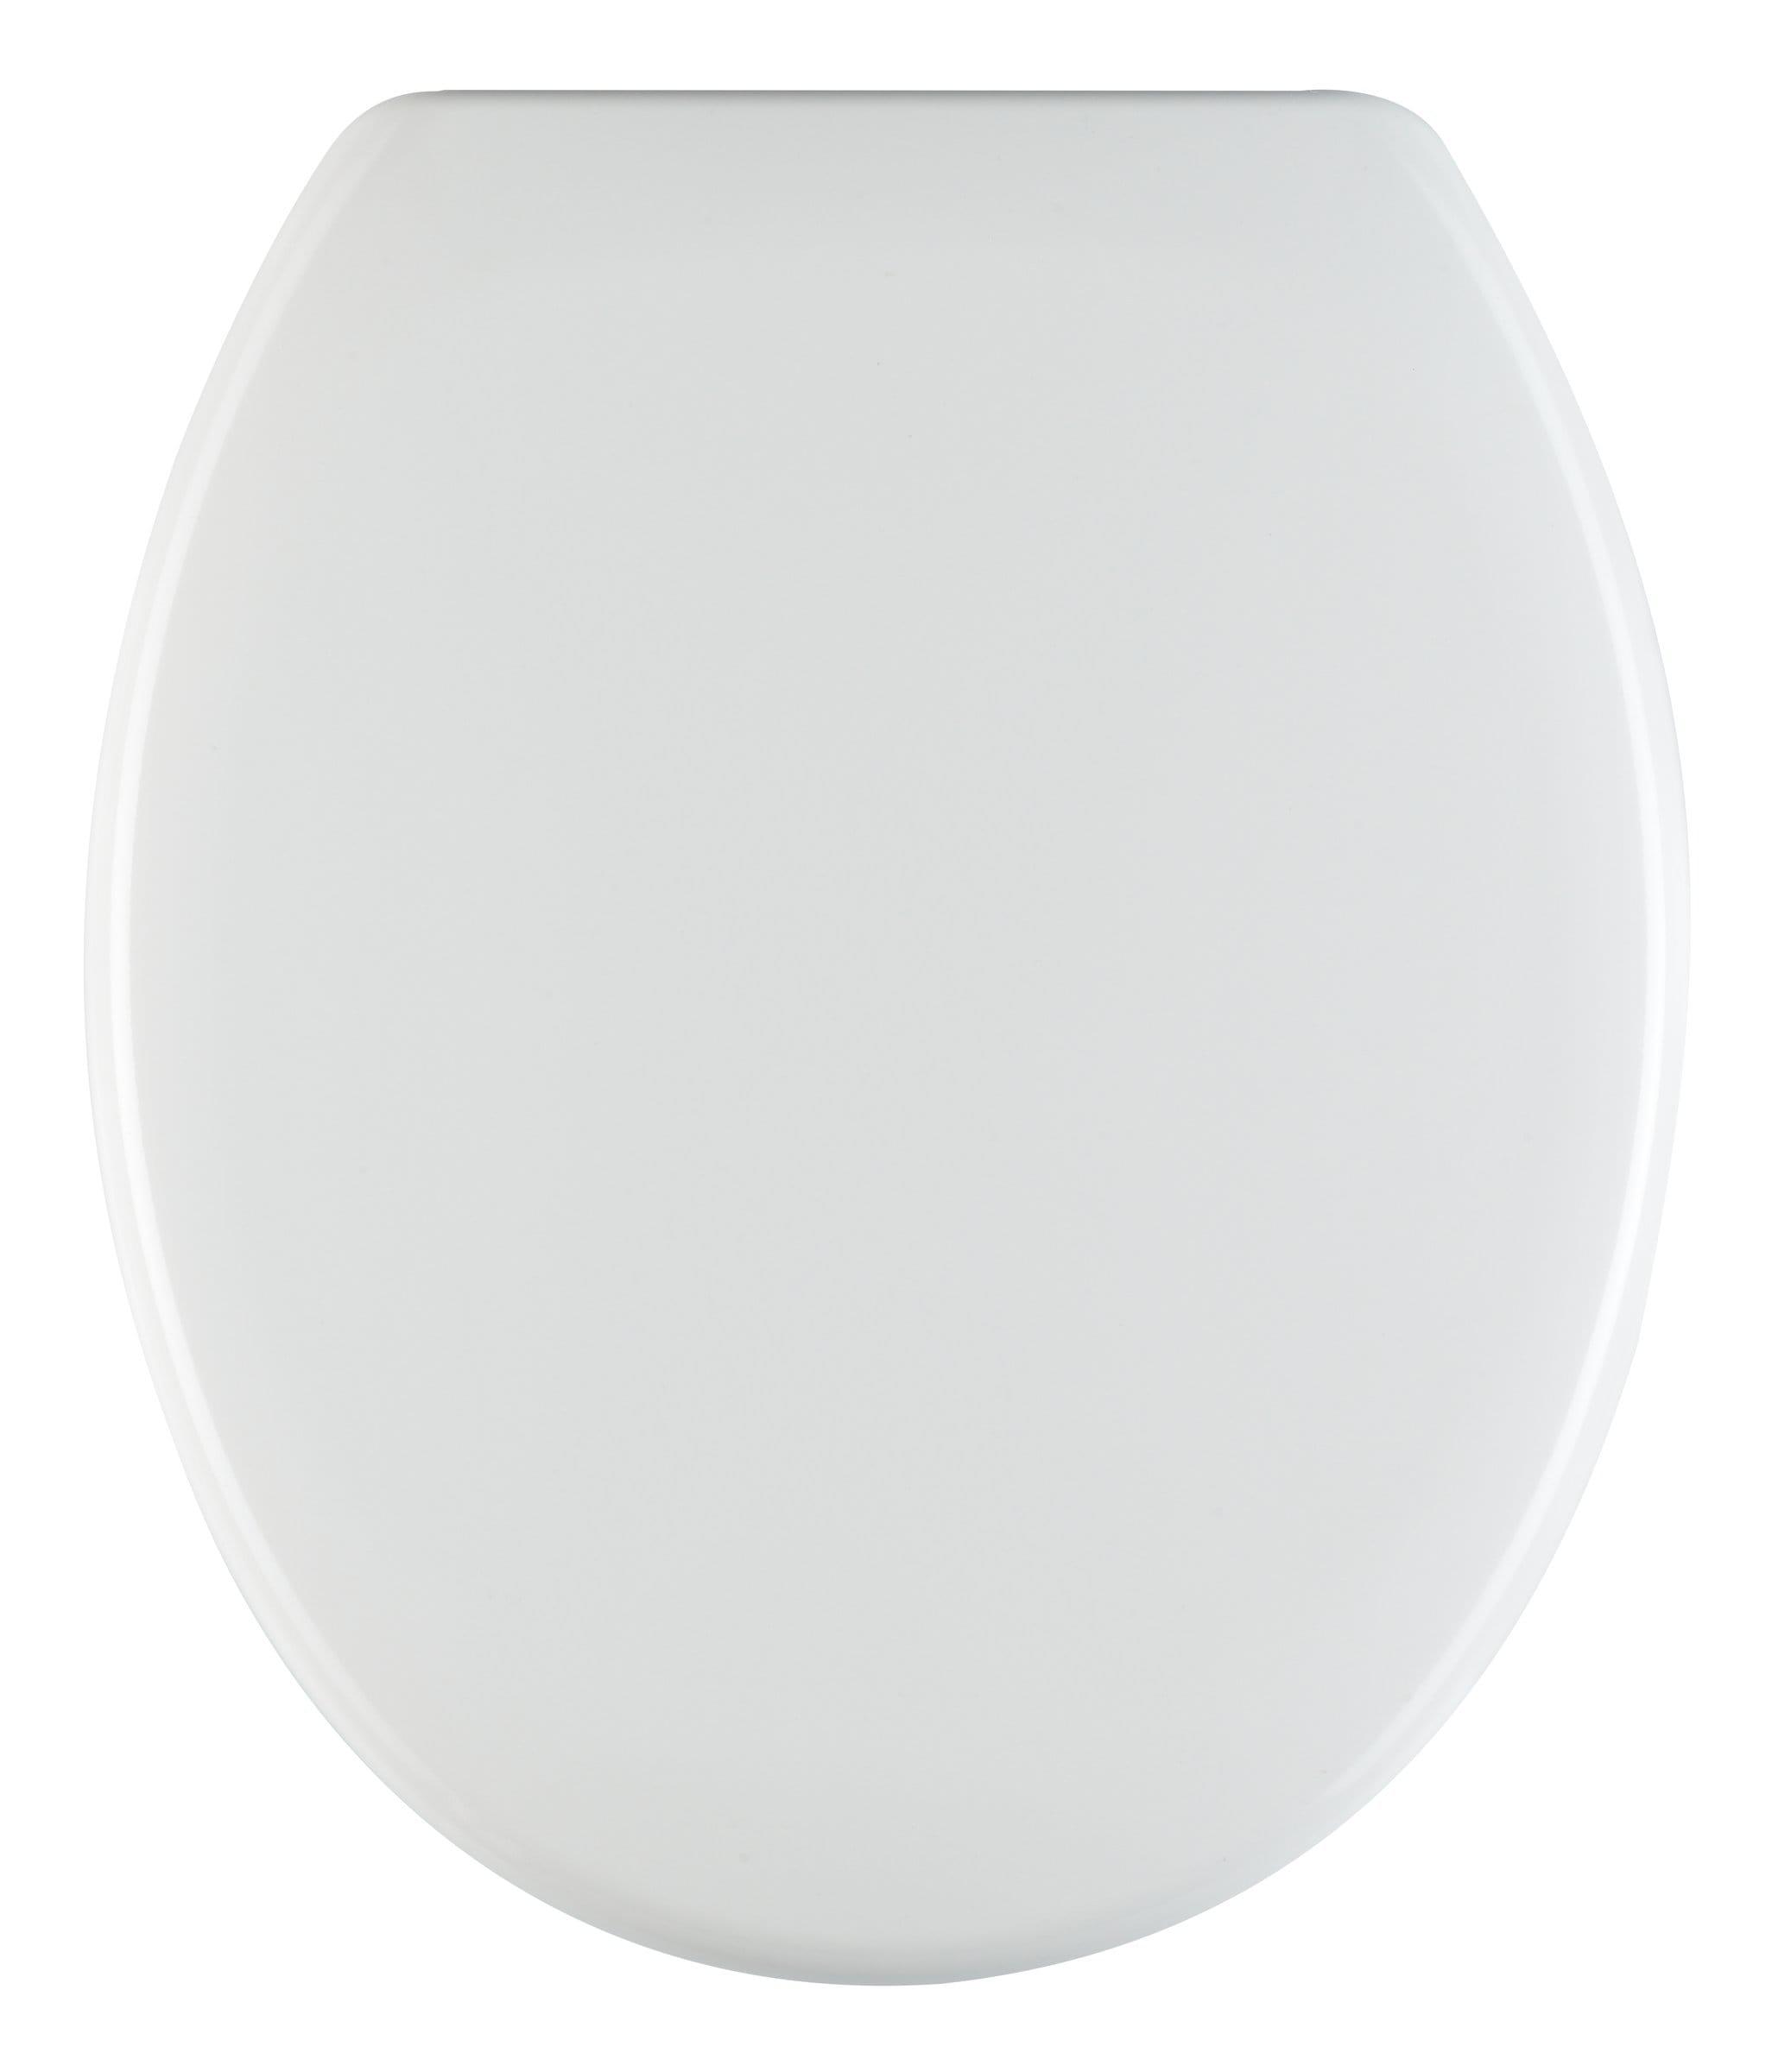 diaqua Sedile WC Barbana